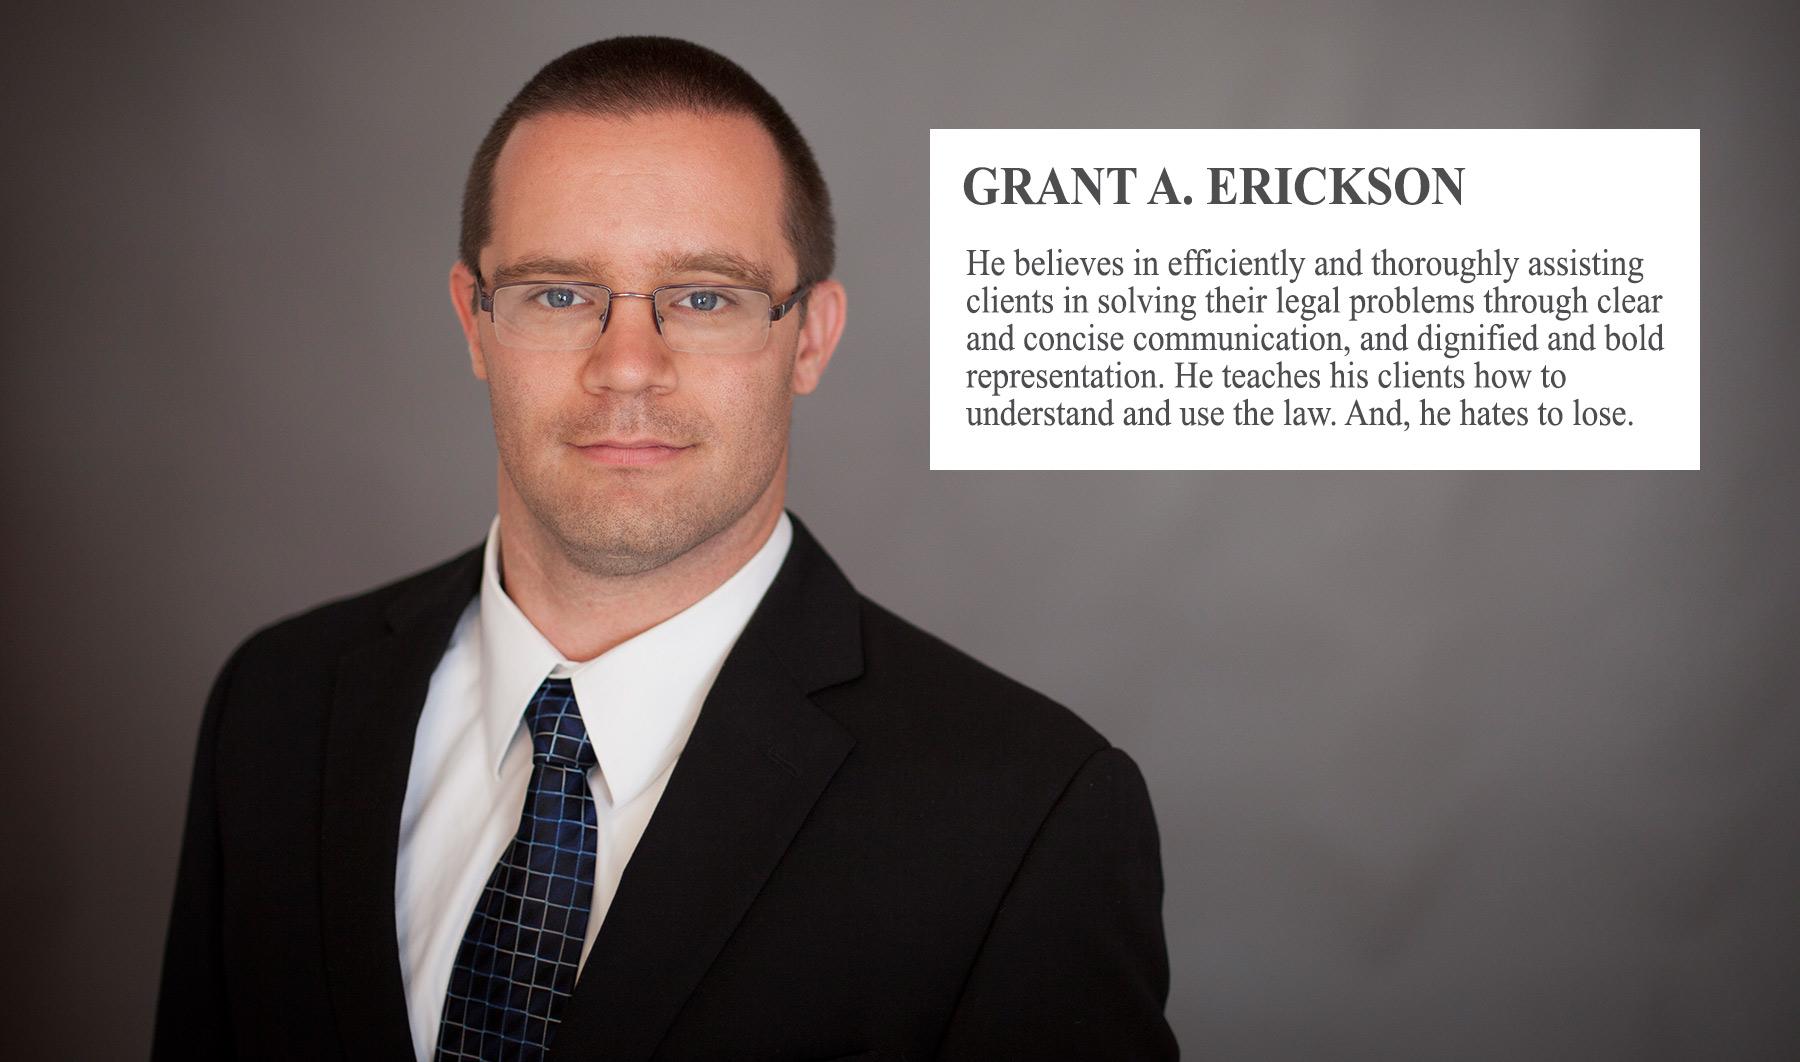 Grant Erickson